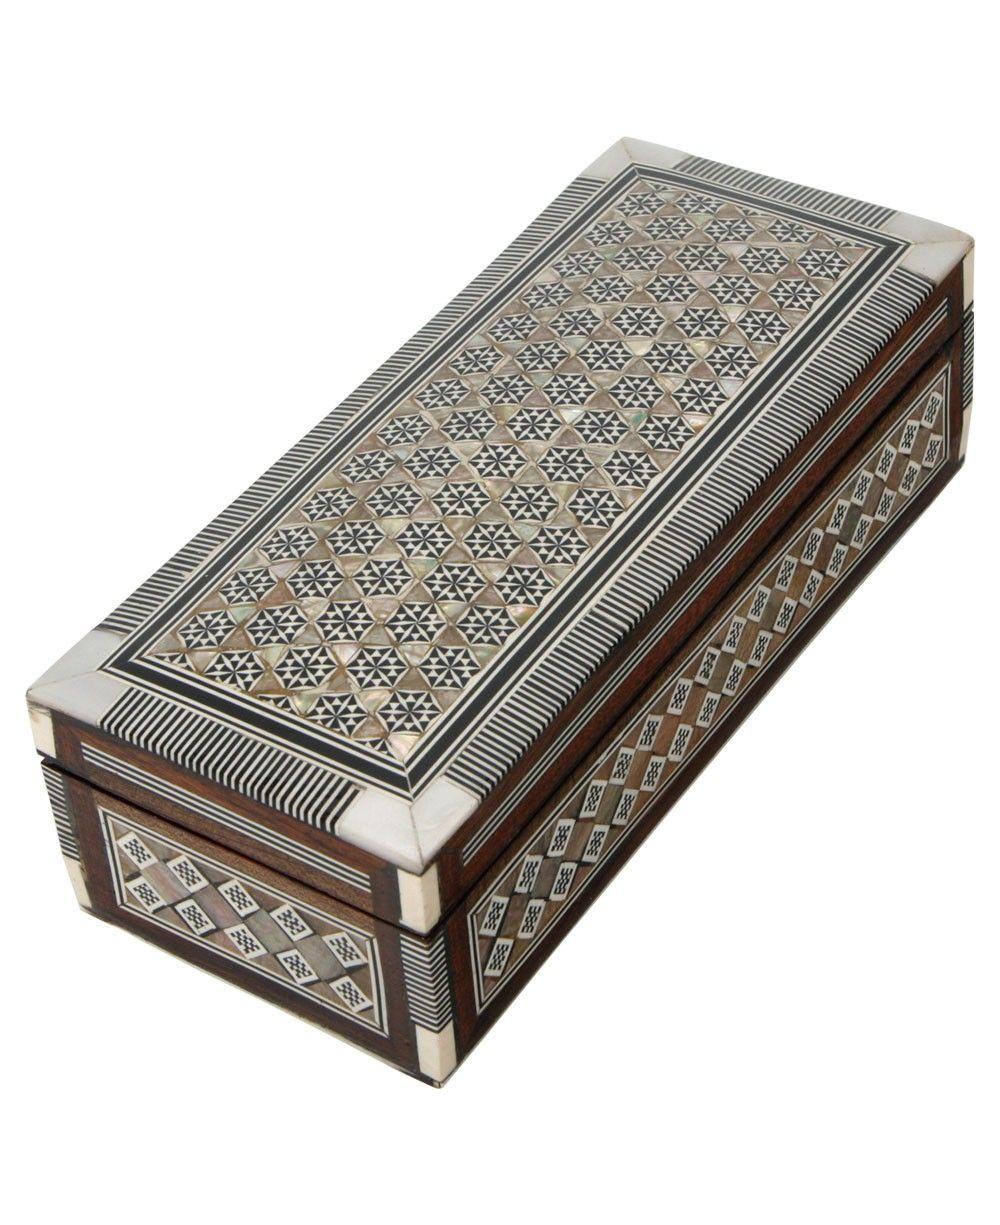 Decorative Photo Boxes Egyptian Mother Of Pearl Decorative Box  Art V  Pinterest